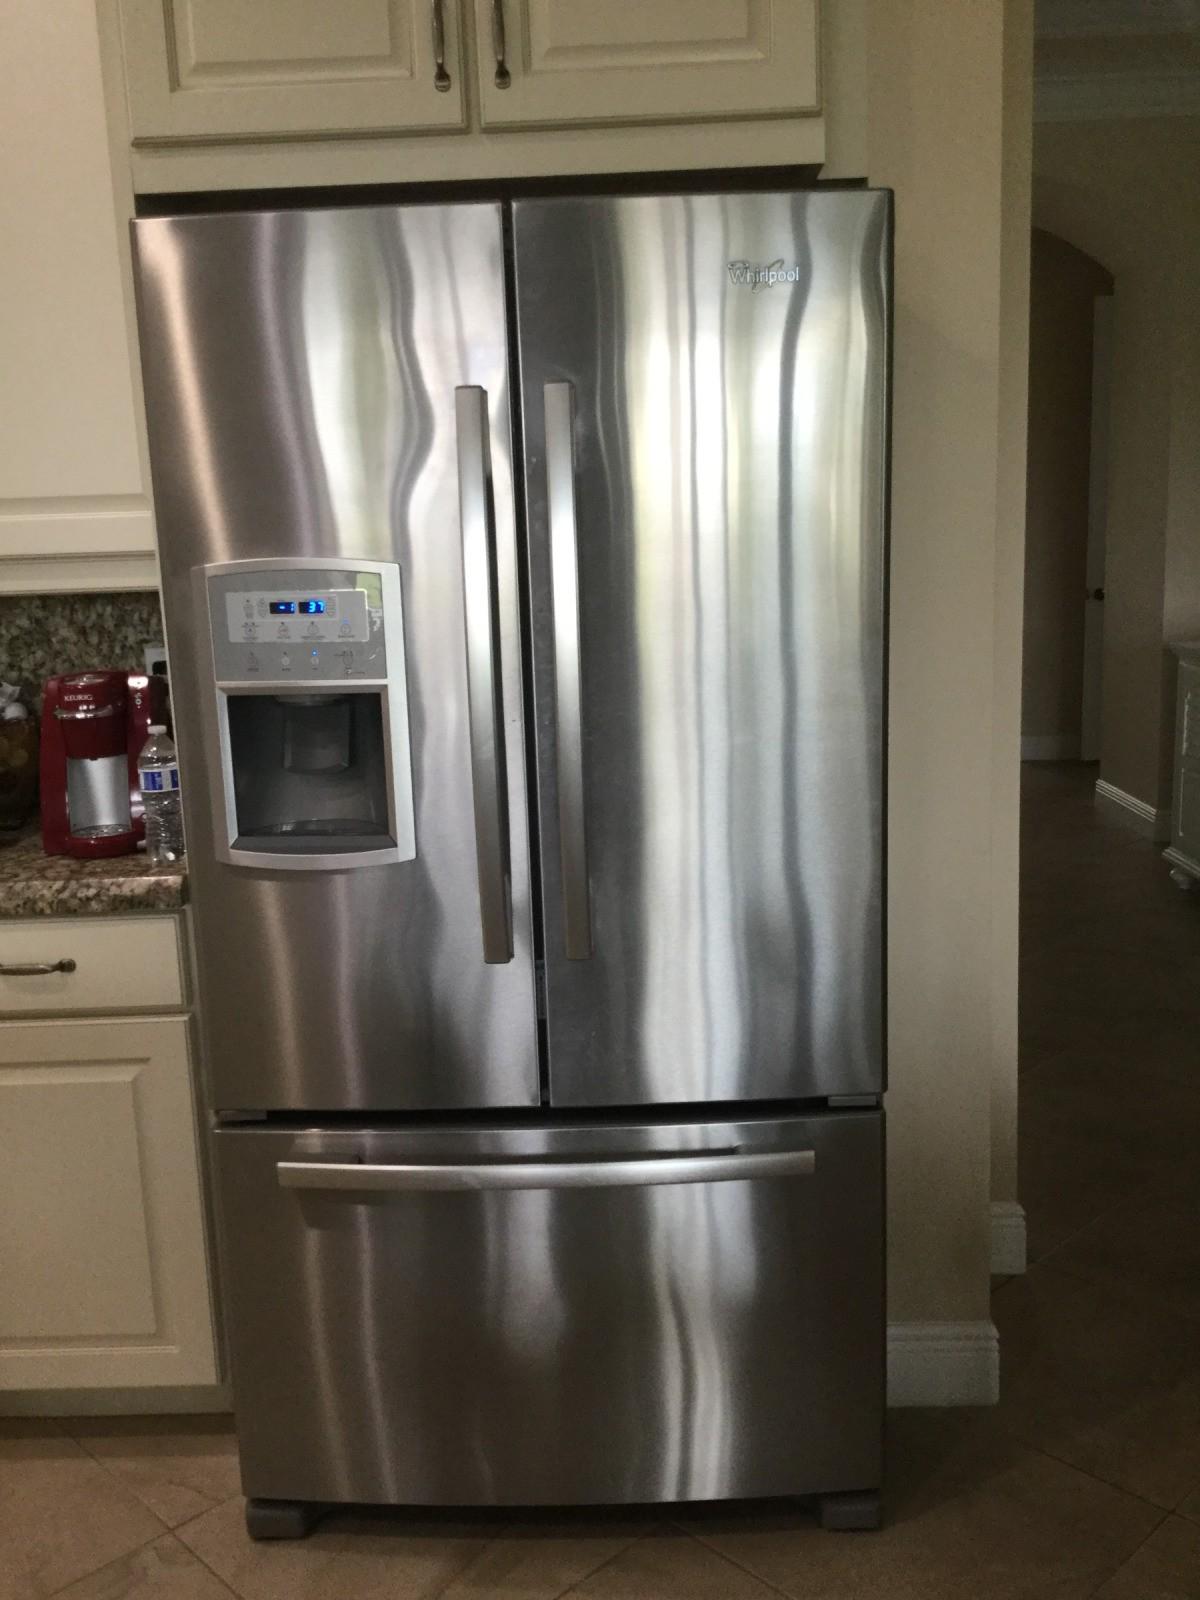 Repairing A Whirlpool Refrigerator Ice Maker